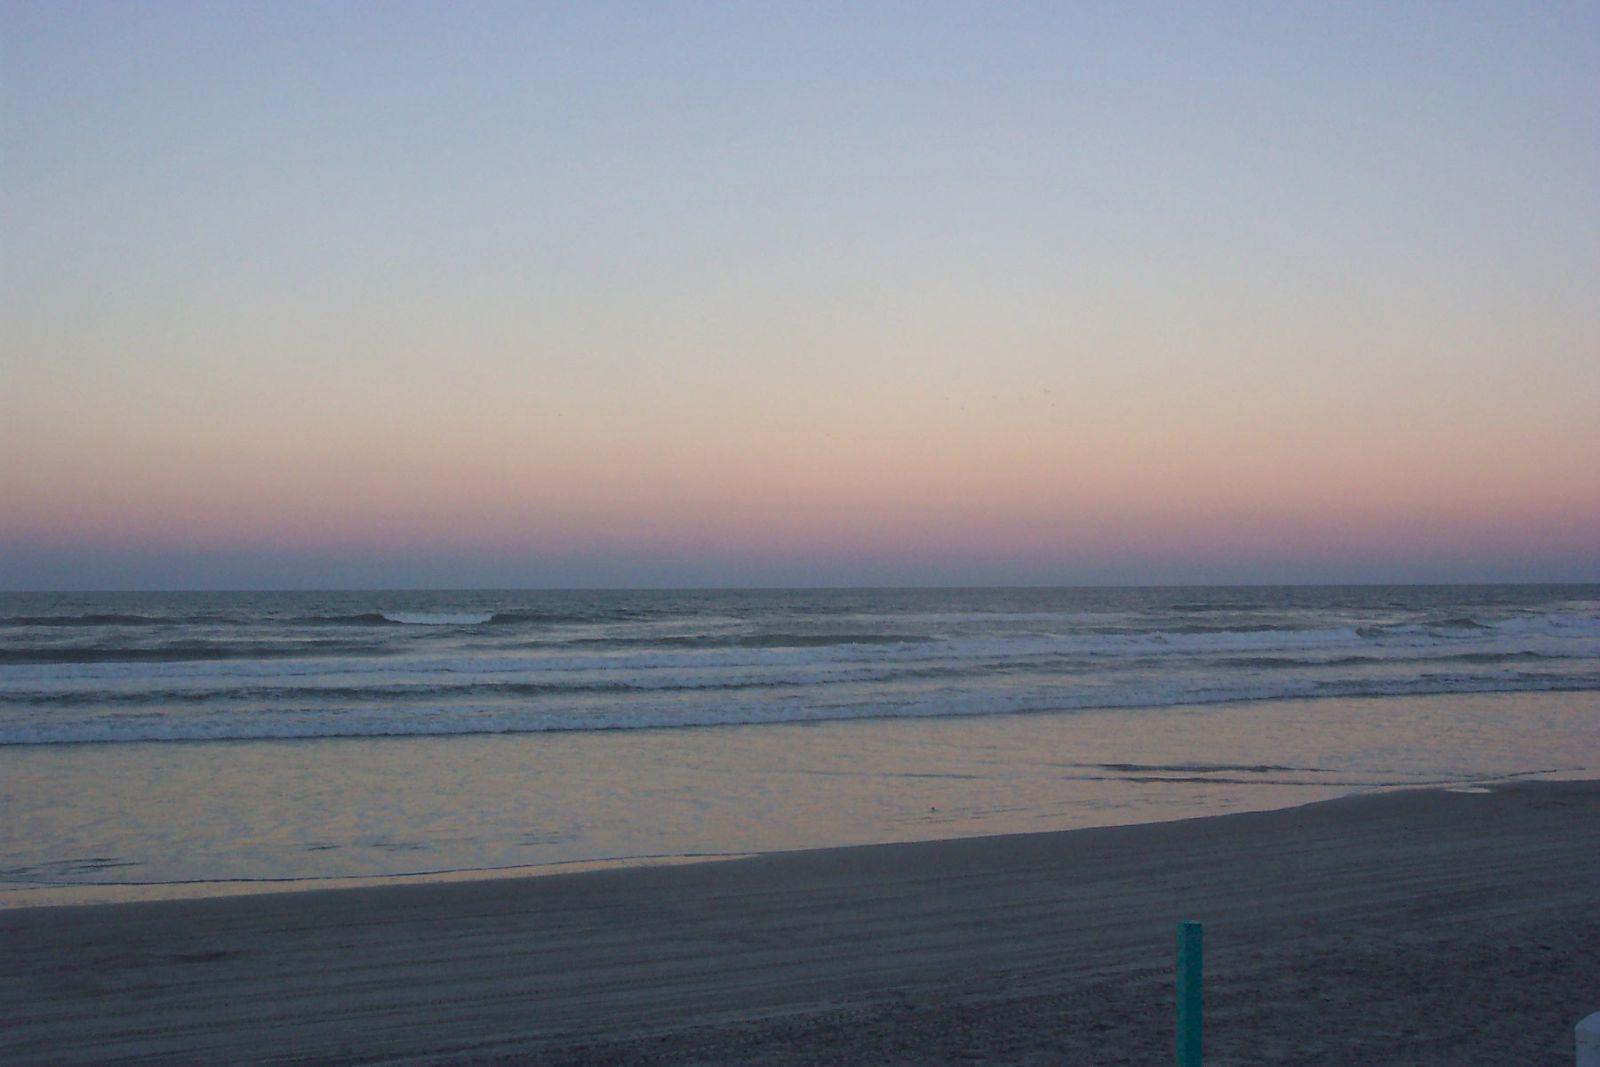 Wallpaper Daytona Beach FL - WallpaperSafari